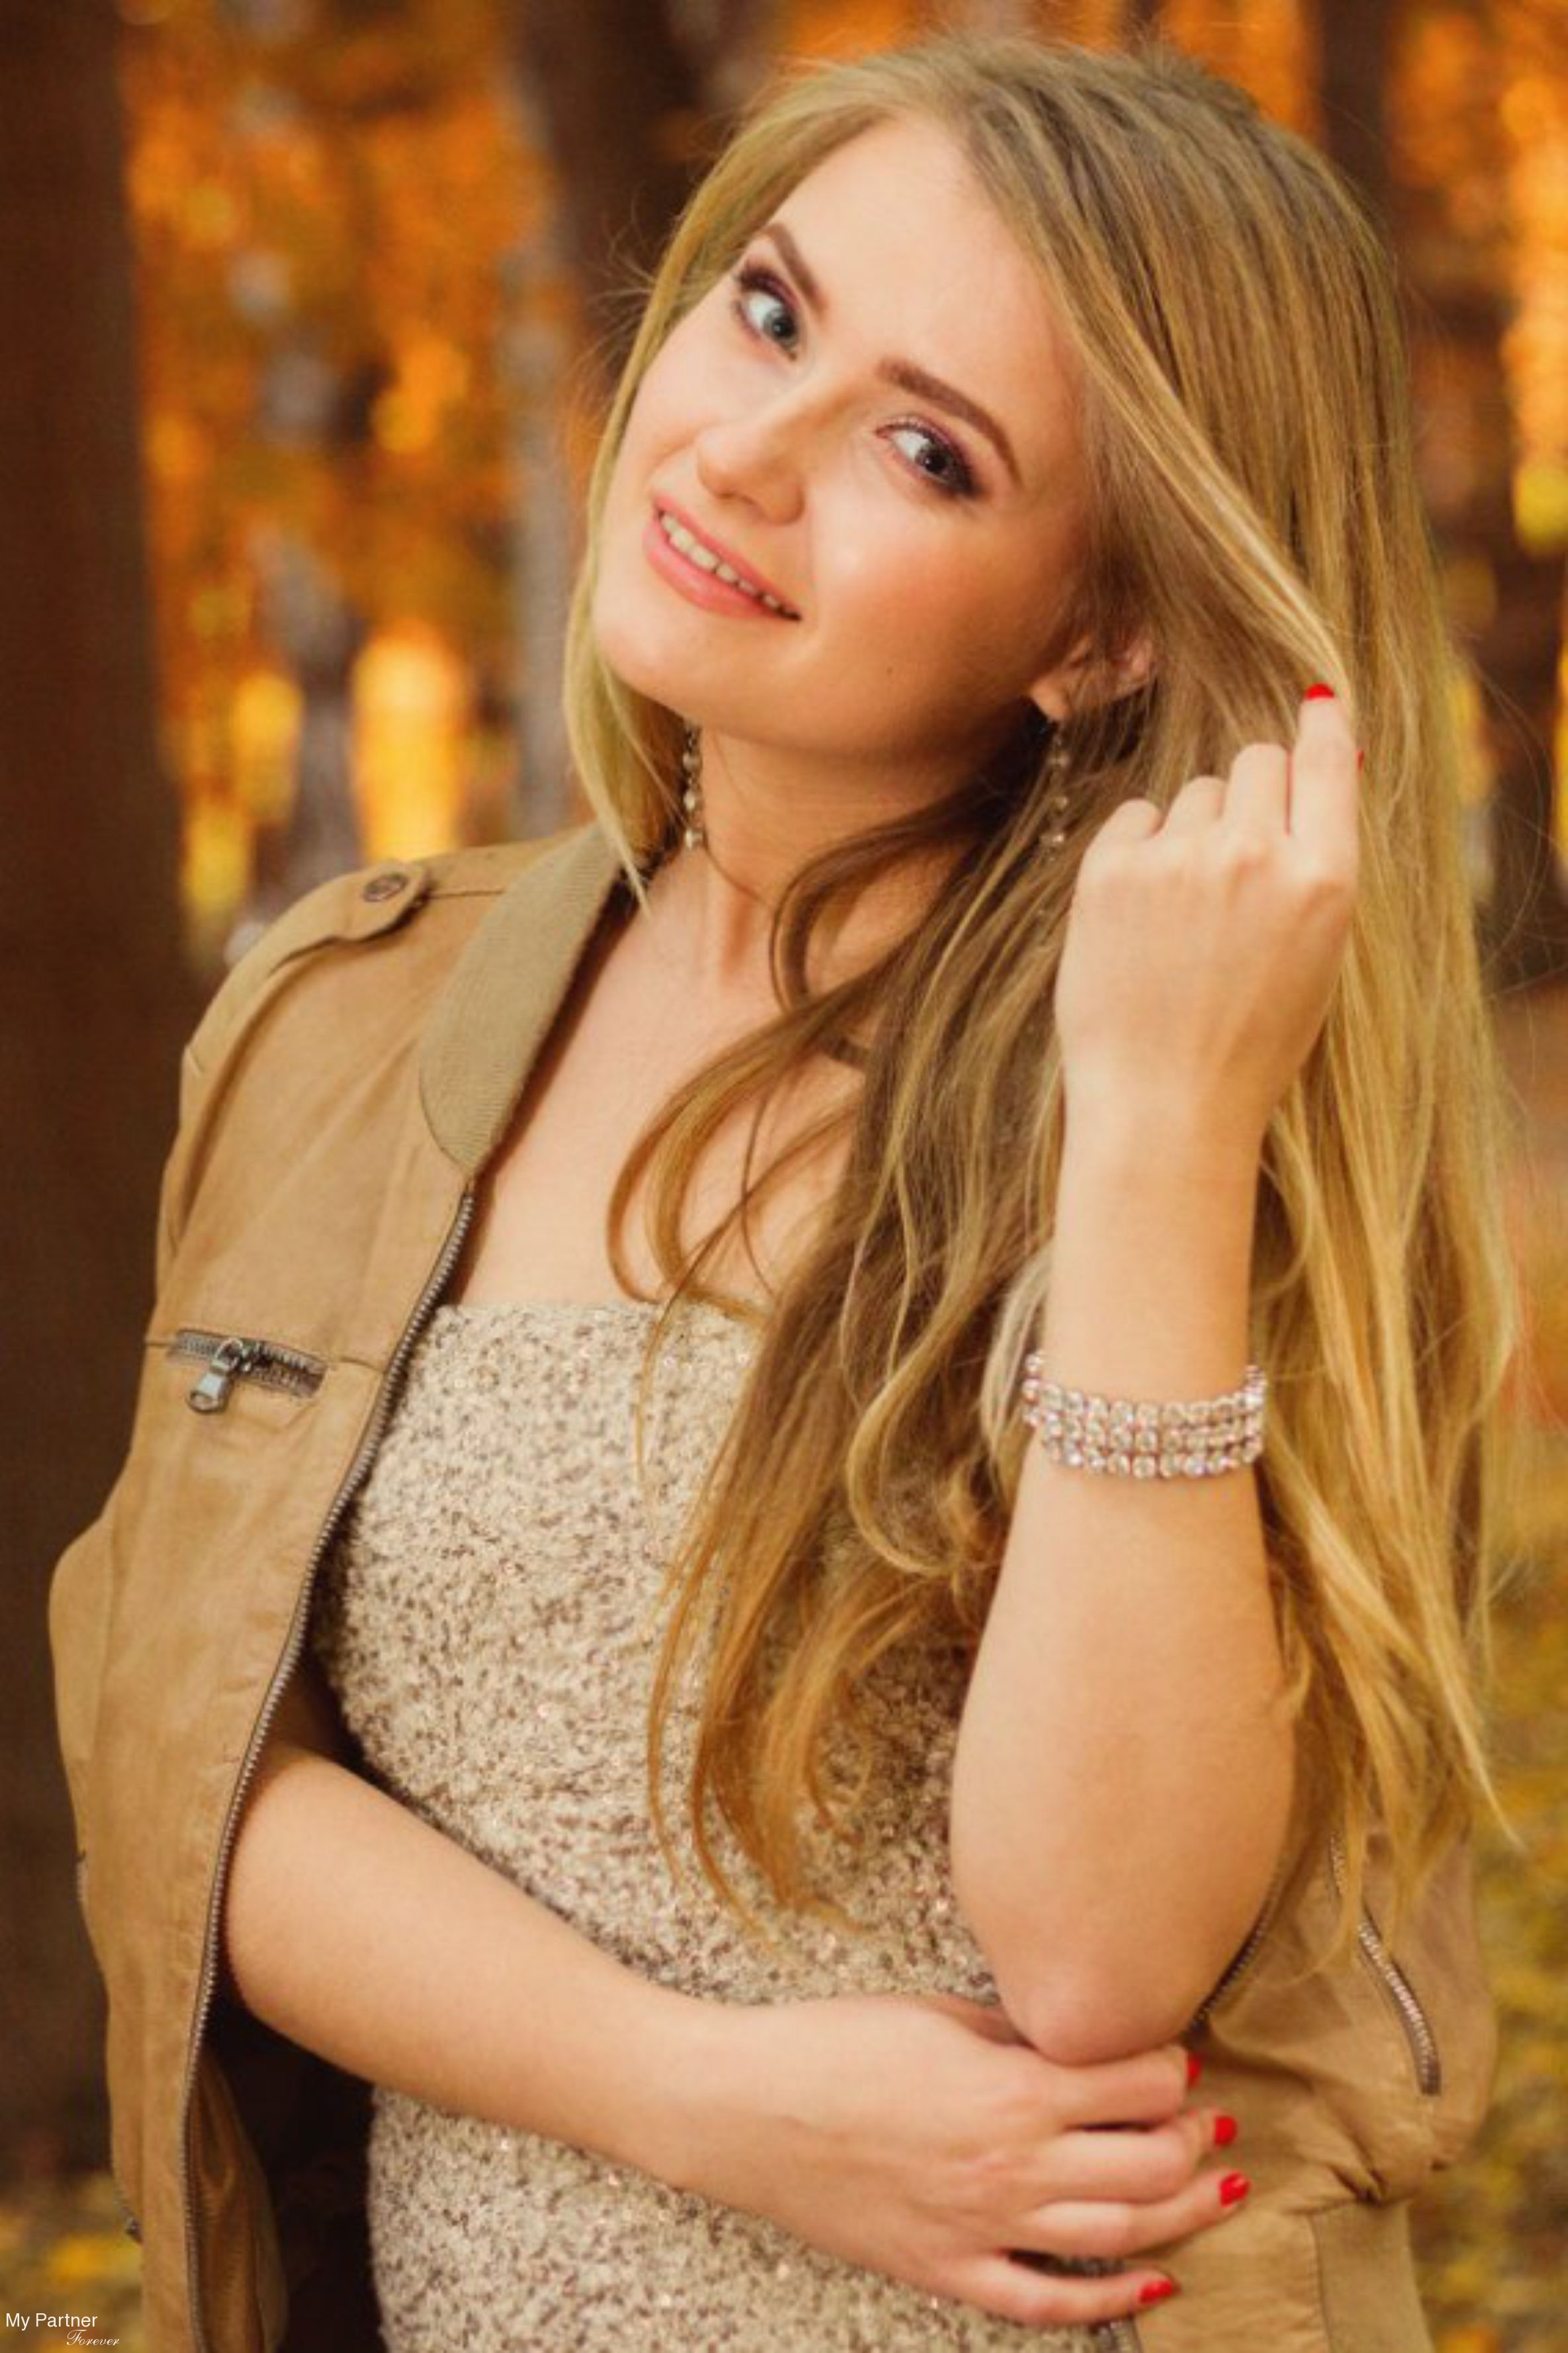 Charming Ukrainian Bride Tatiyana from Vinnitsa, Ukraine